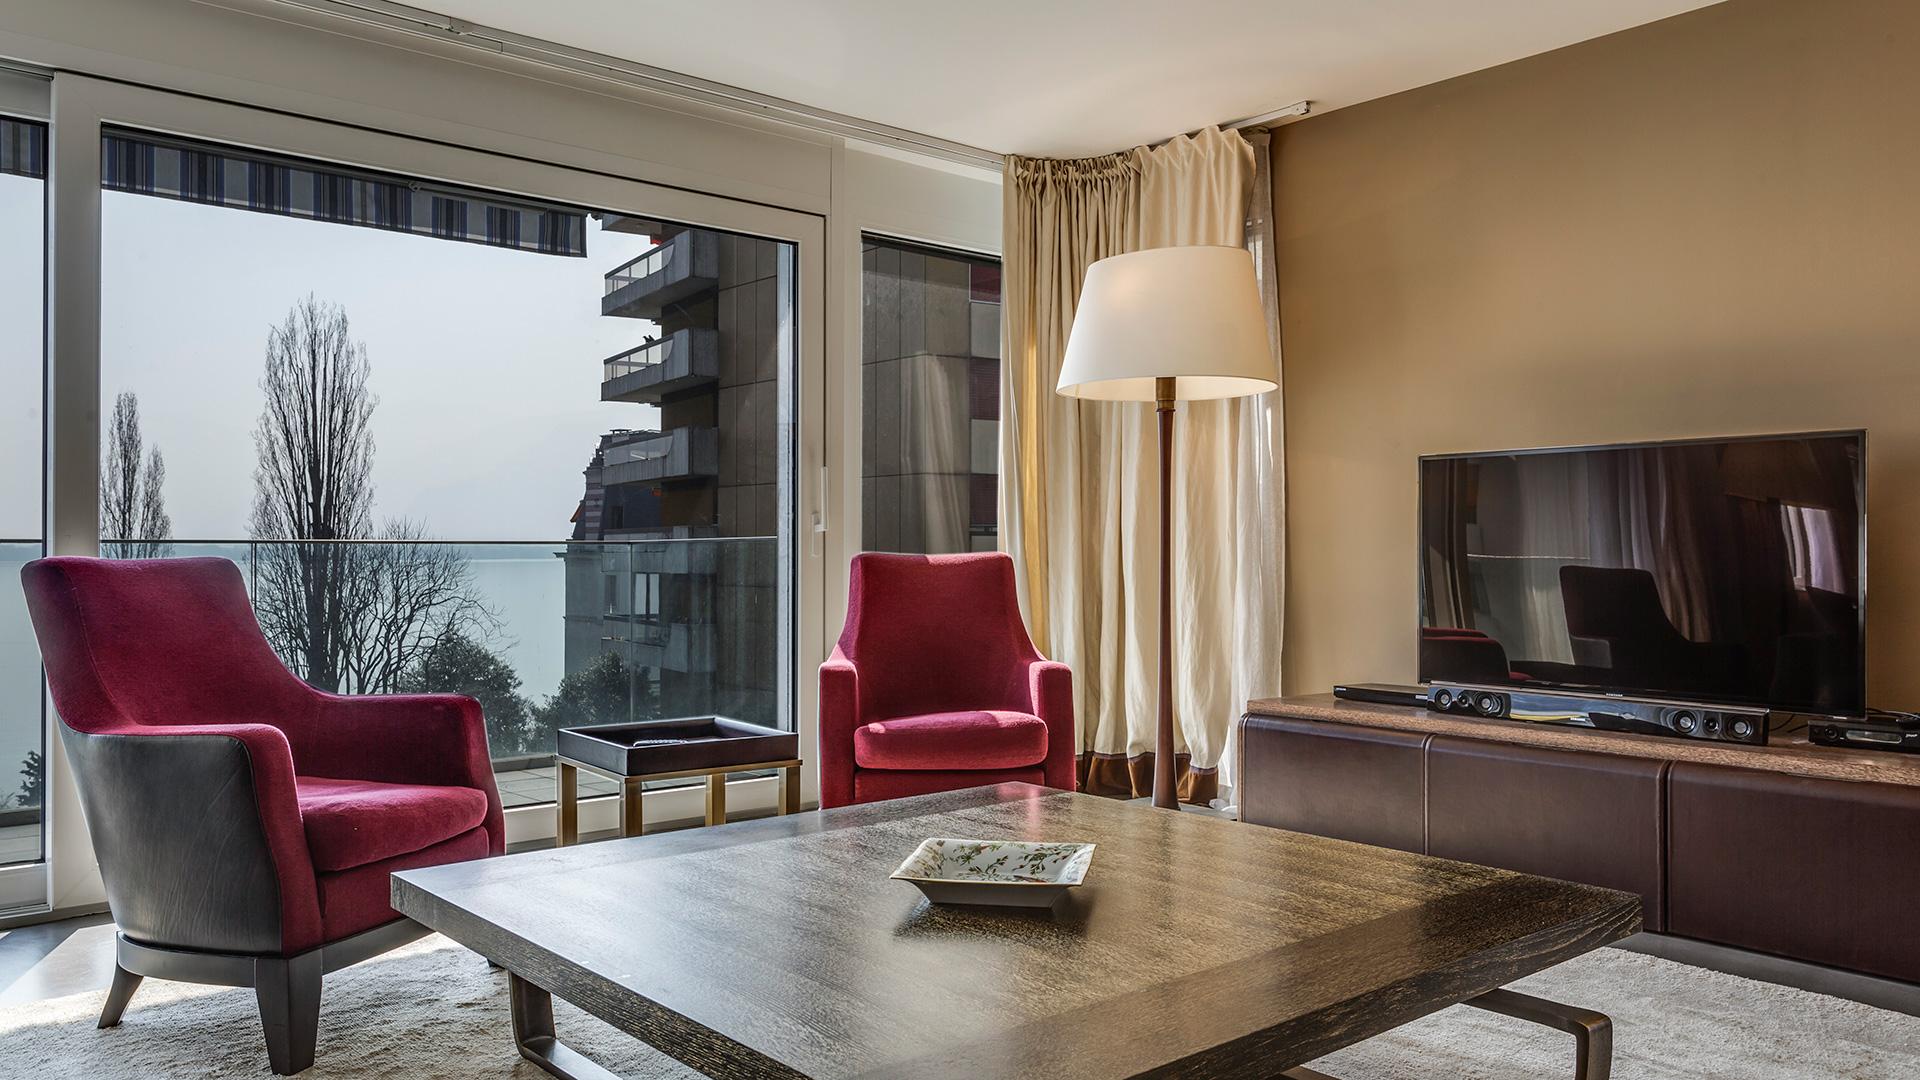 Le Theatre Apartments, Switzerland